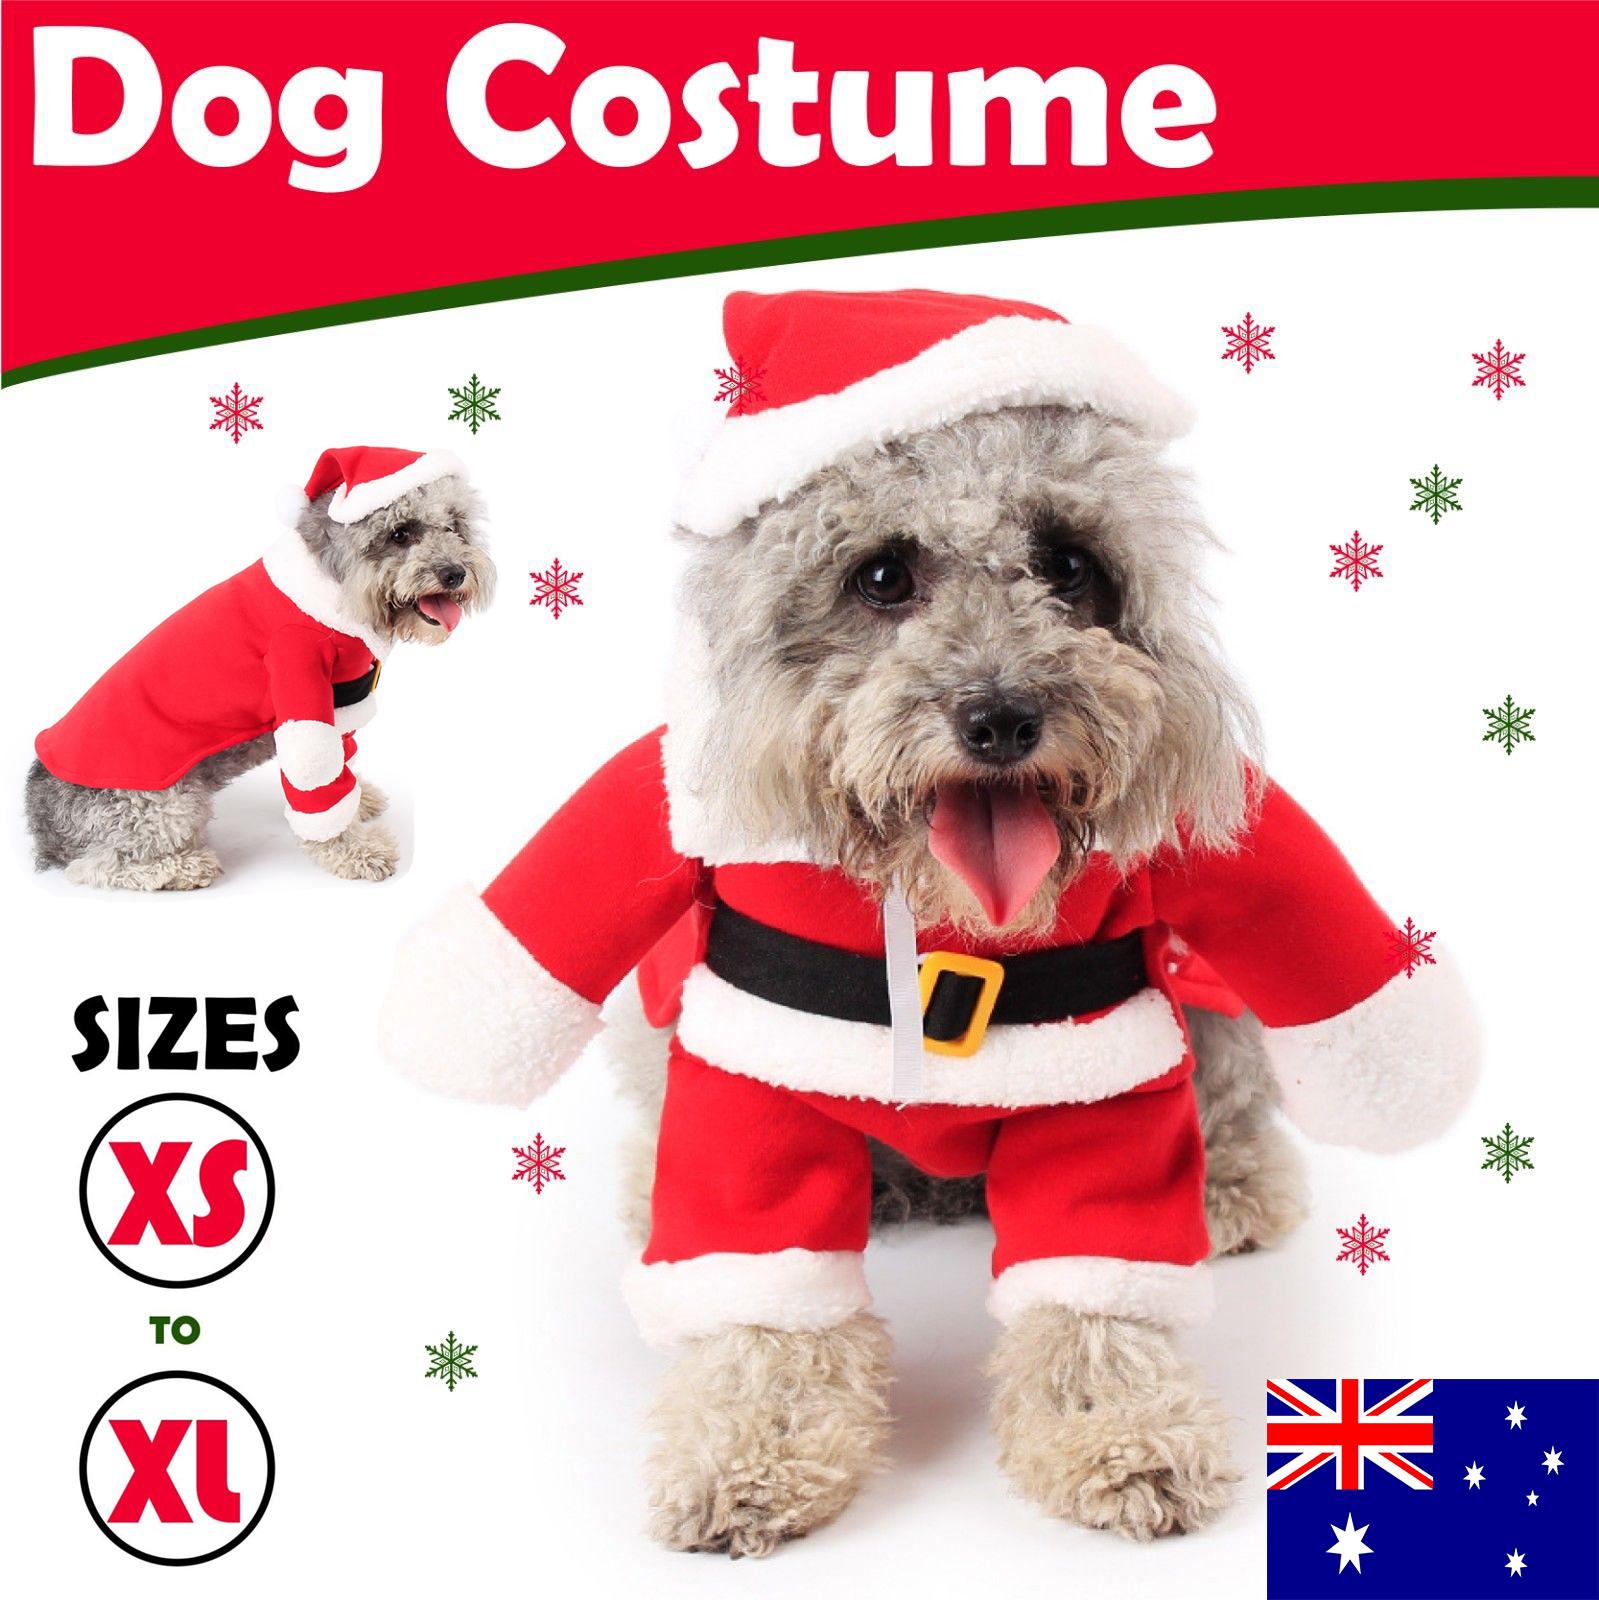 Christmas Pet Costumes.Details About Santa Christmas Dog Dress Puppy Cat Coat Winter Clothes Pet Costumes Apparel